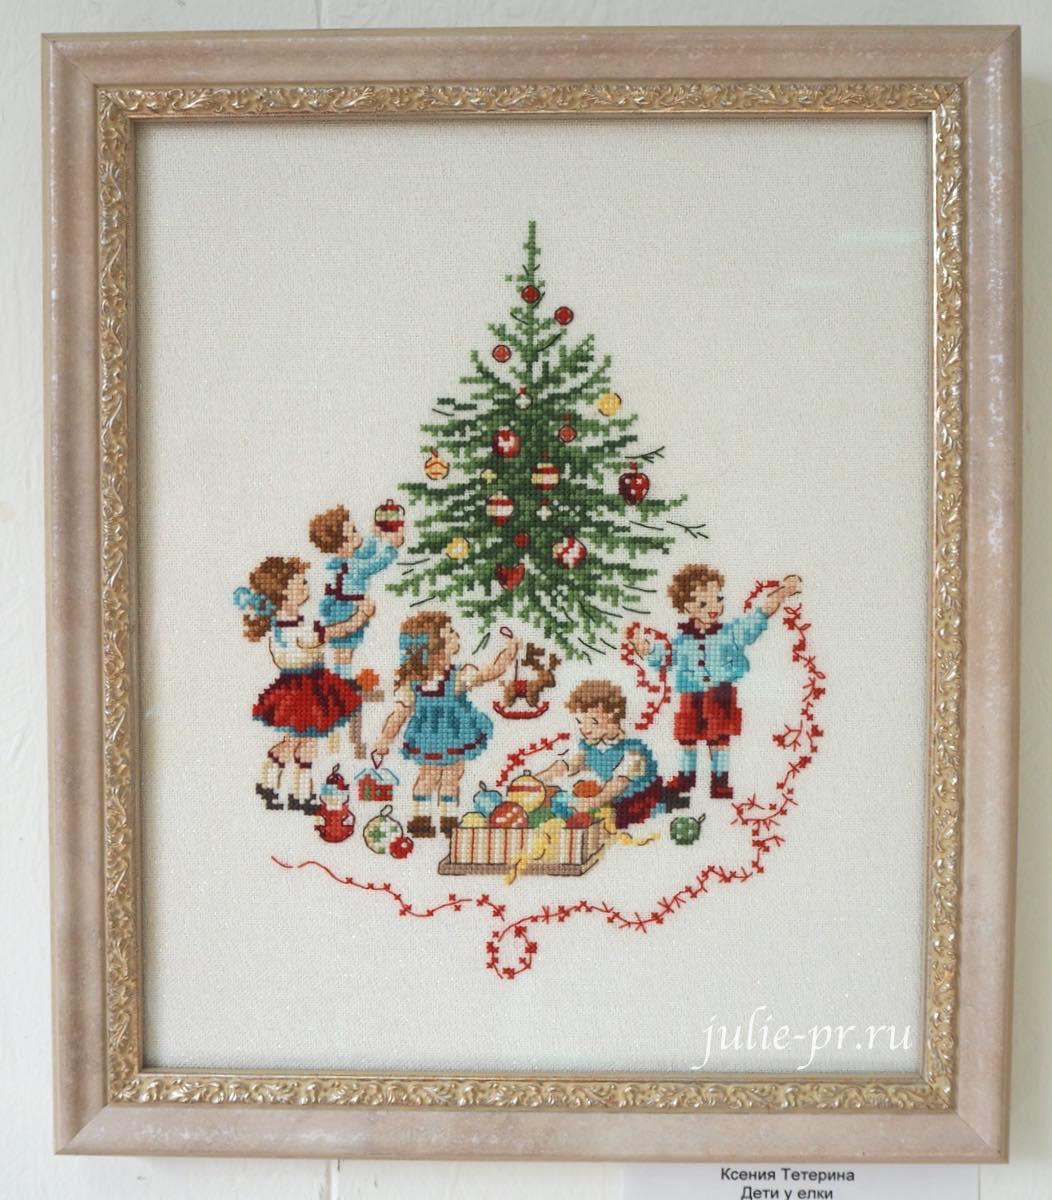 Veronique Enginger, елка, дети, вышивка крестом, La magie de Noel